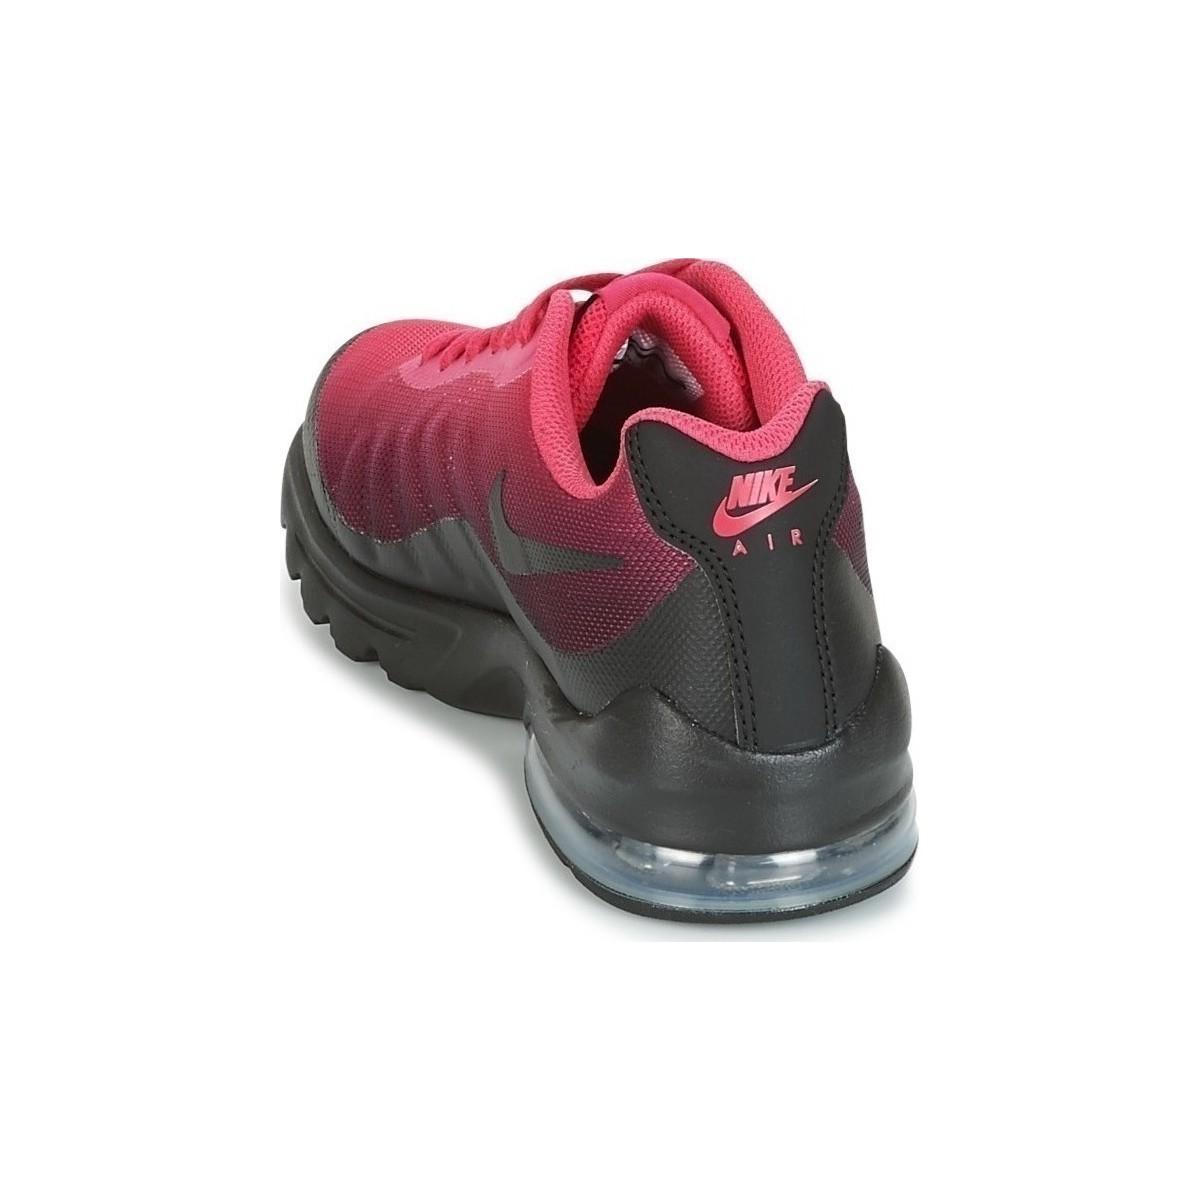 Nike air max invigor print zapatillas mujer rosas ah5261 600 Barato Amazon Barato Venta New 2DiLt8P7N